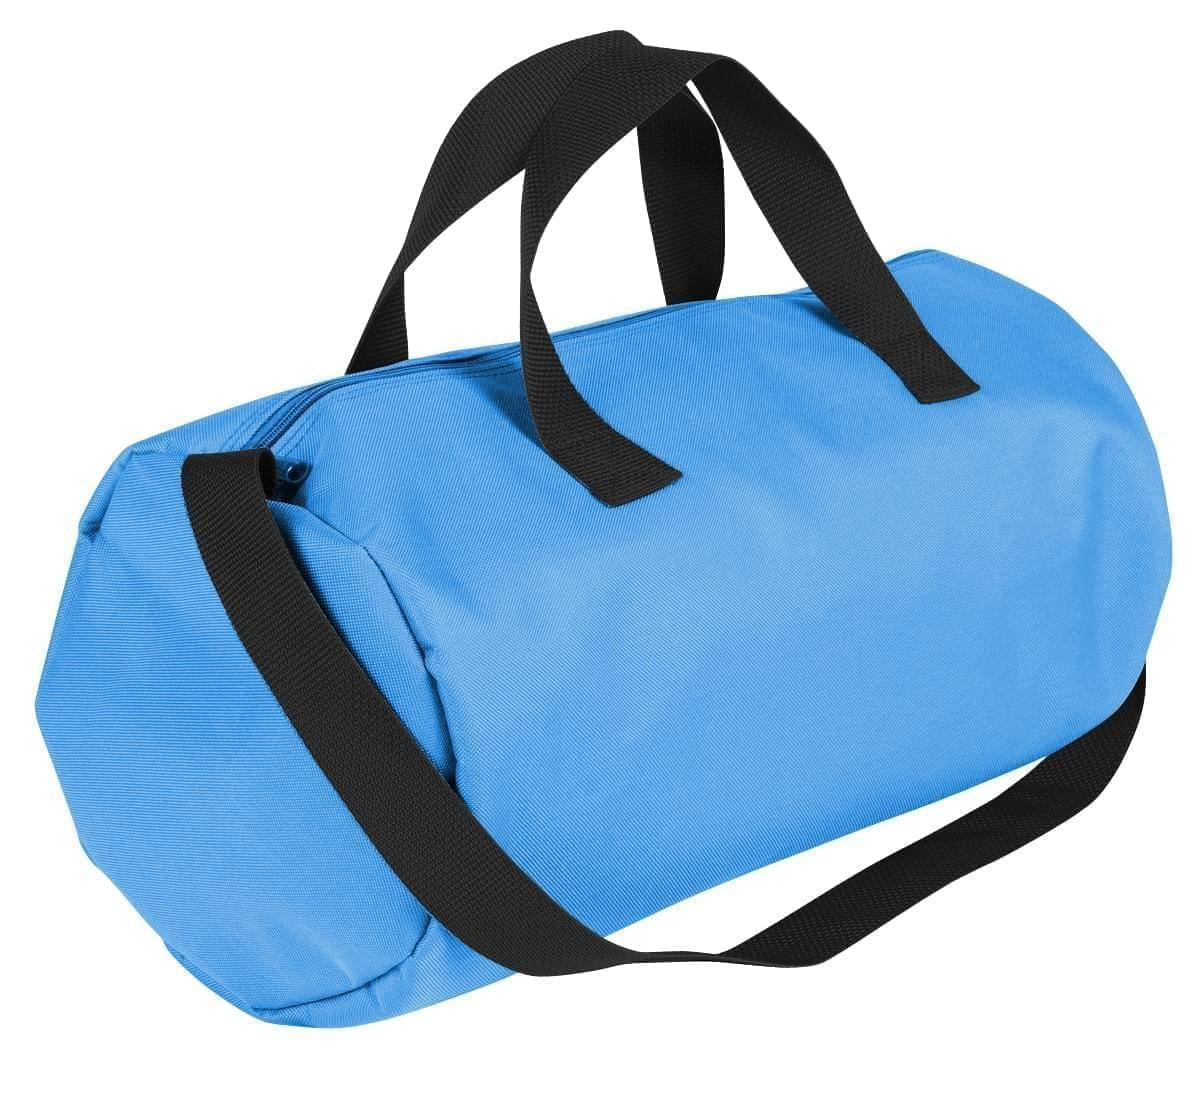 USA Made Nylon Poly Gym Roll Bags, Columbia-Black, ROCX31AAUR